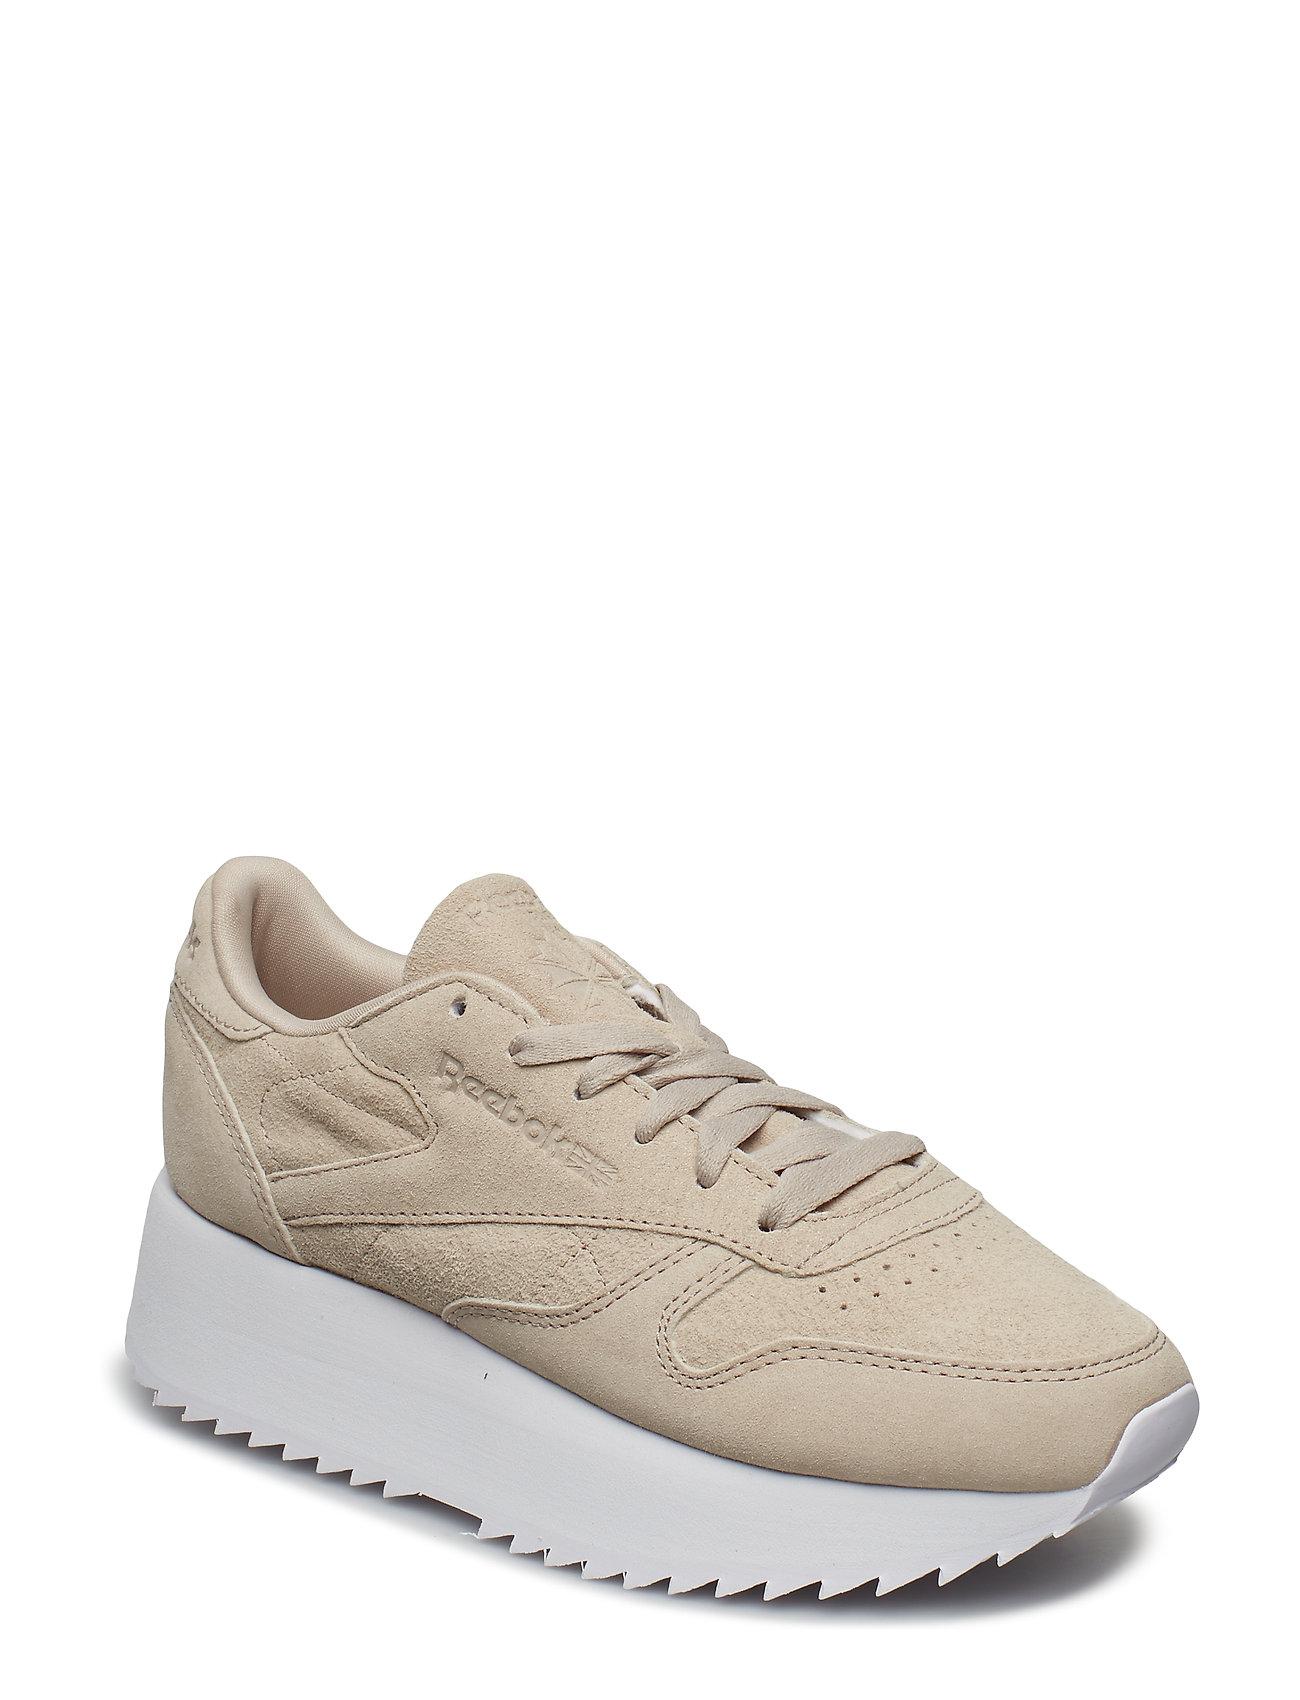 REEBOK Cl Lthr Double Niedrige Sneaker Creme REEBOK CLASSICS